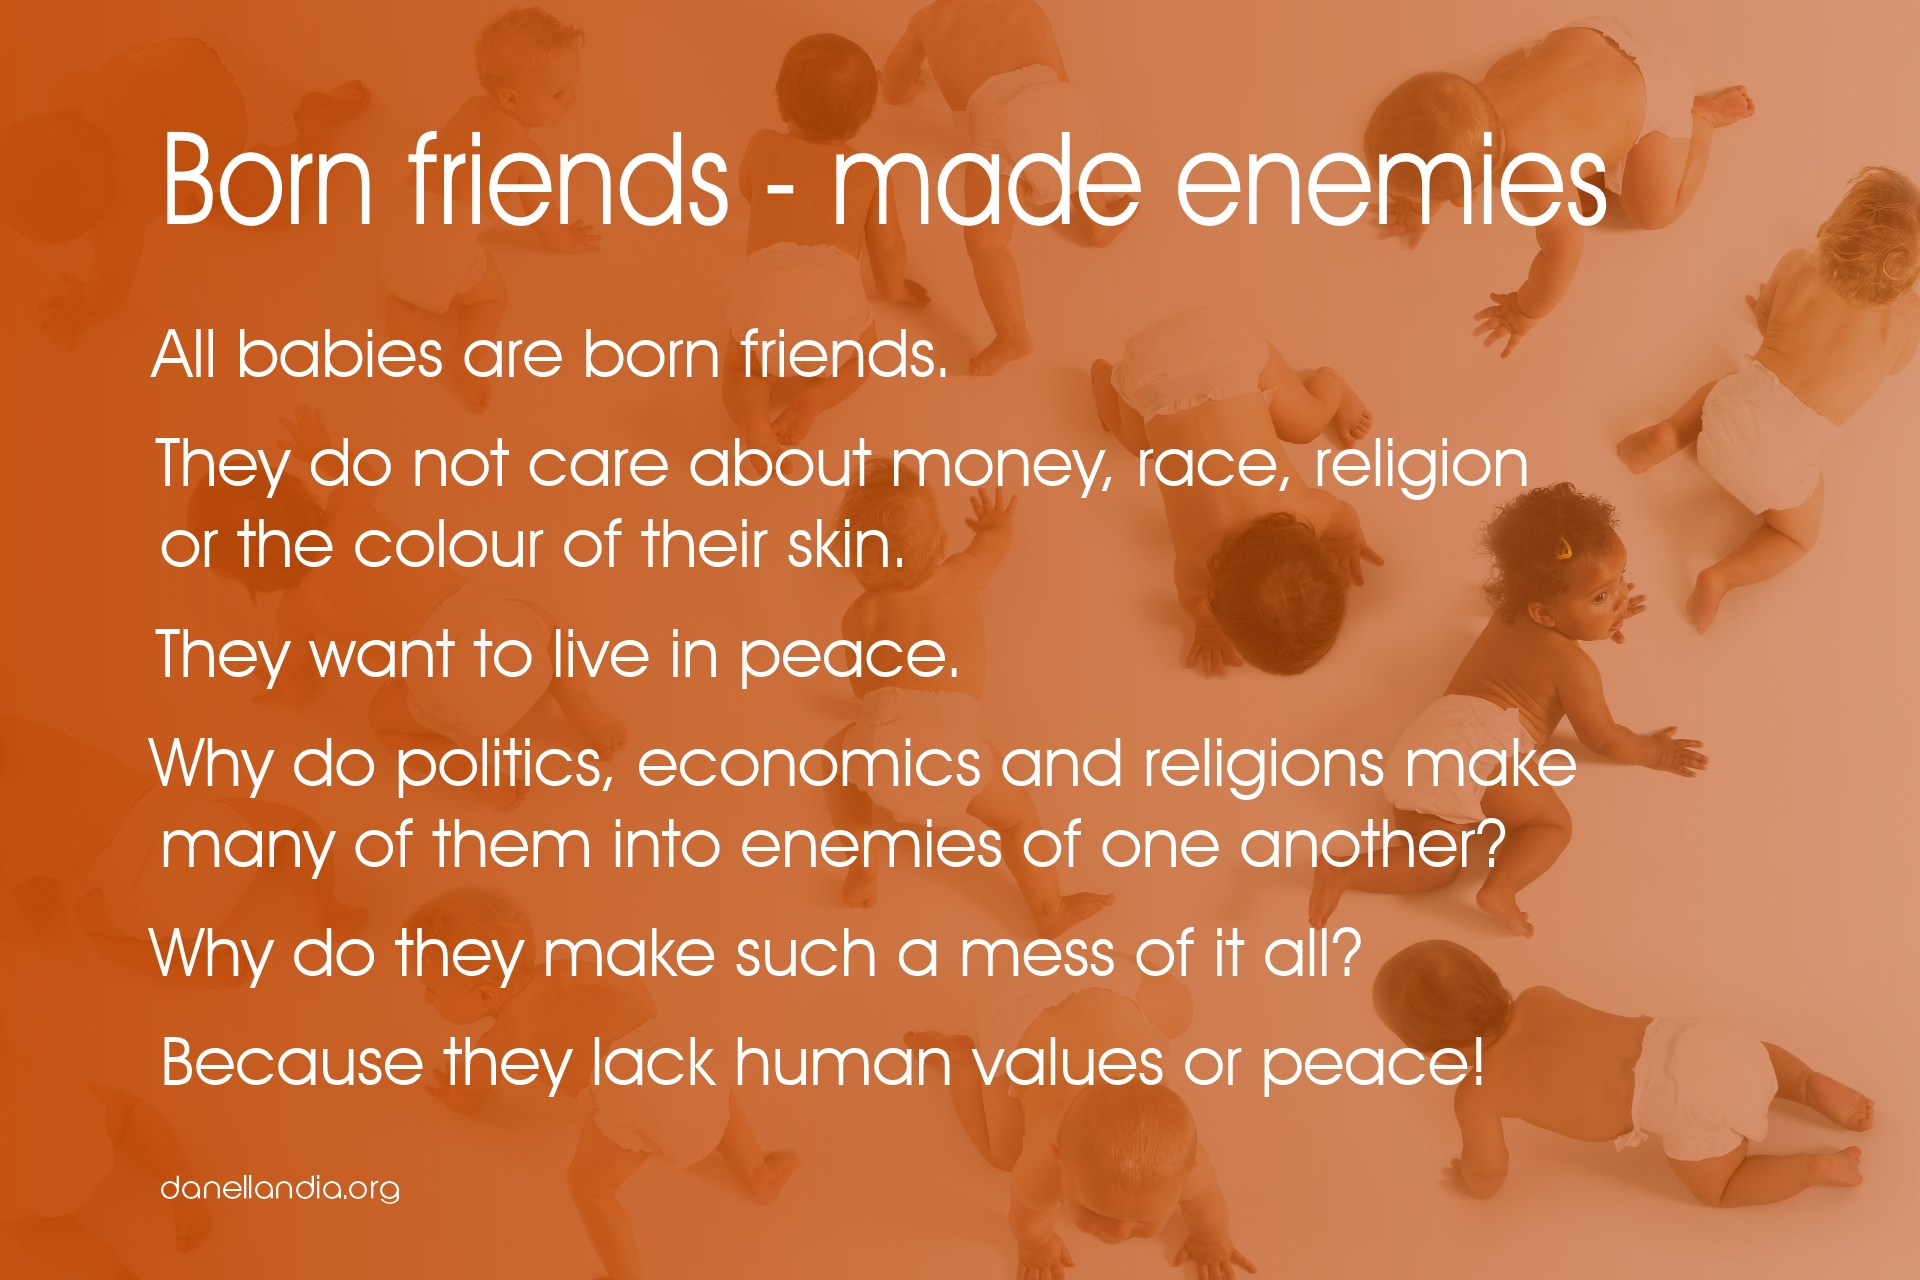 Born friends - made enemies